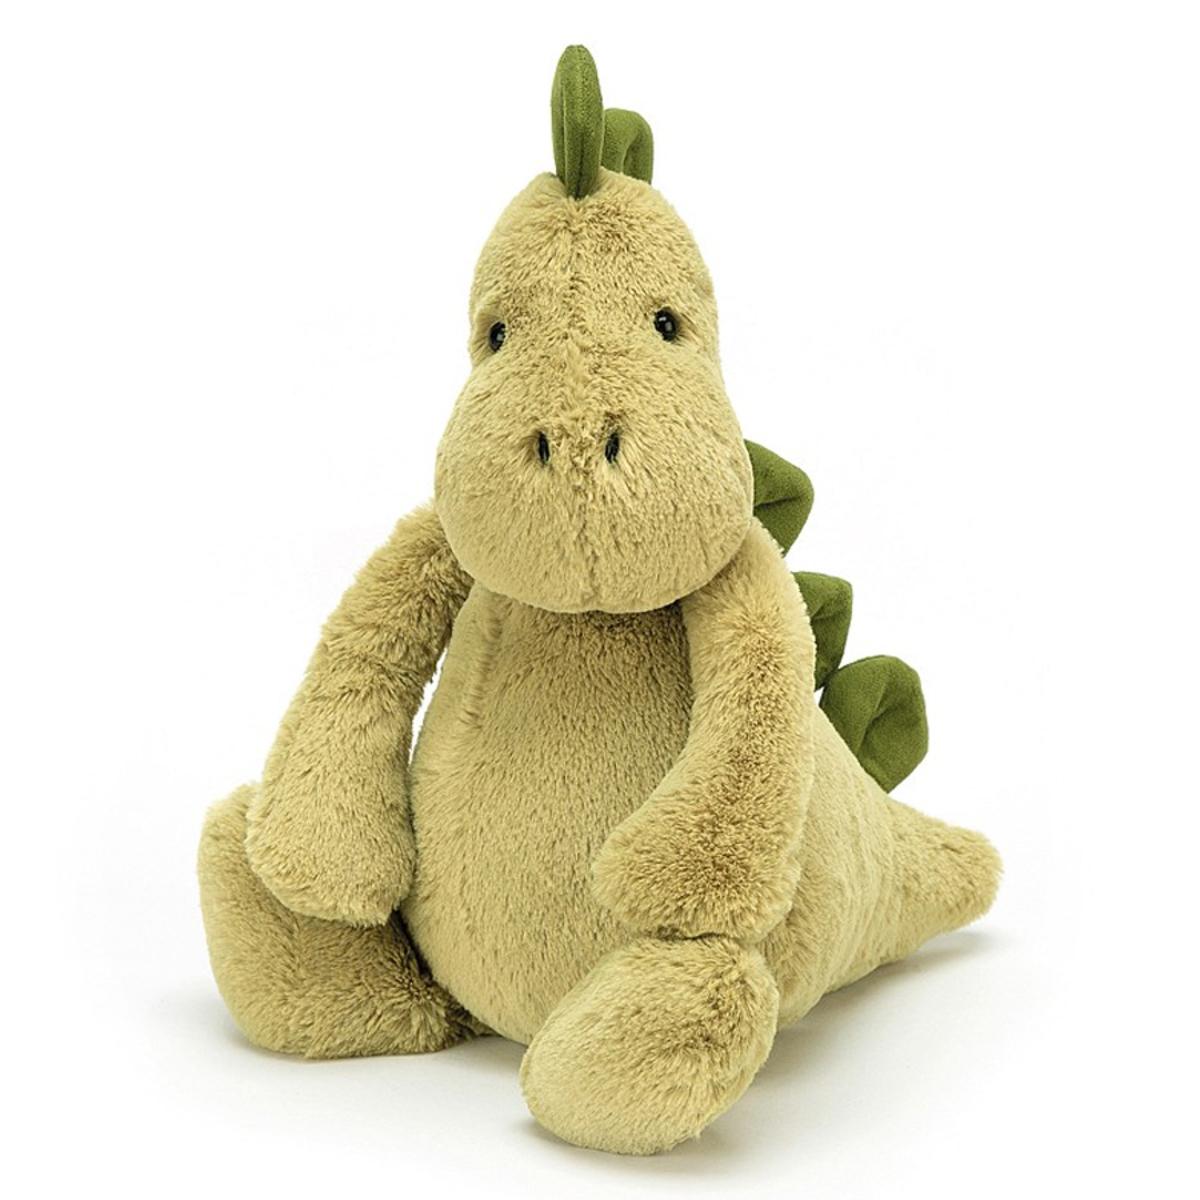 Peluche Bashful Dino - Medium Bashful Dino - Medium